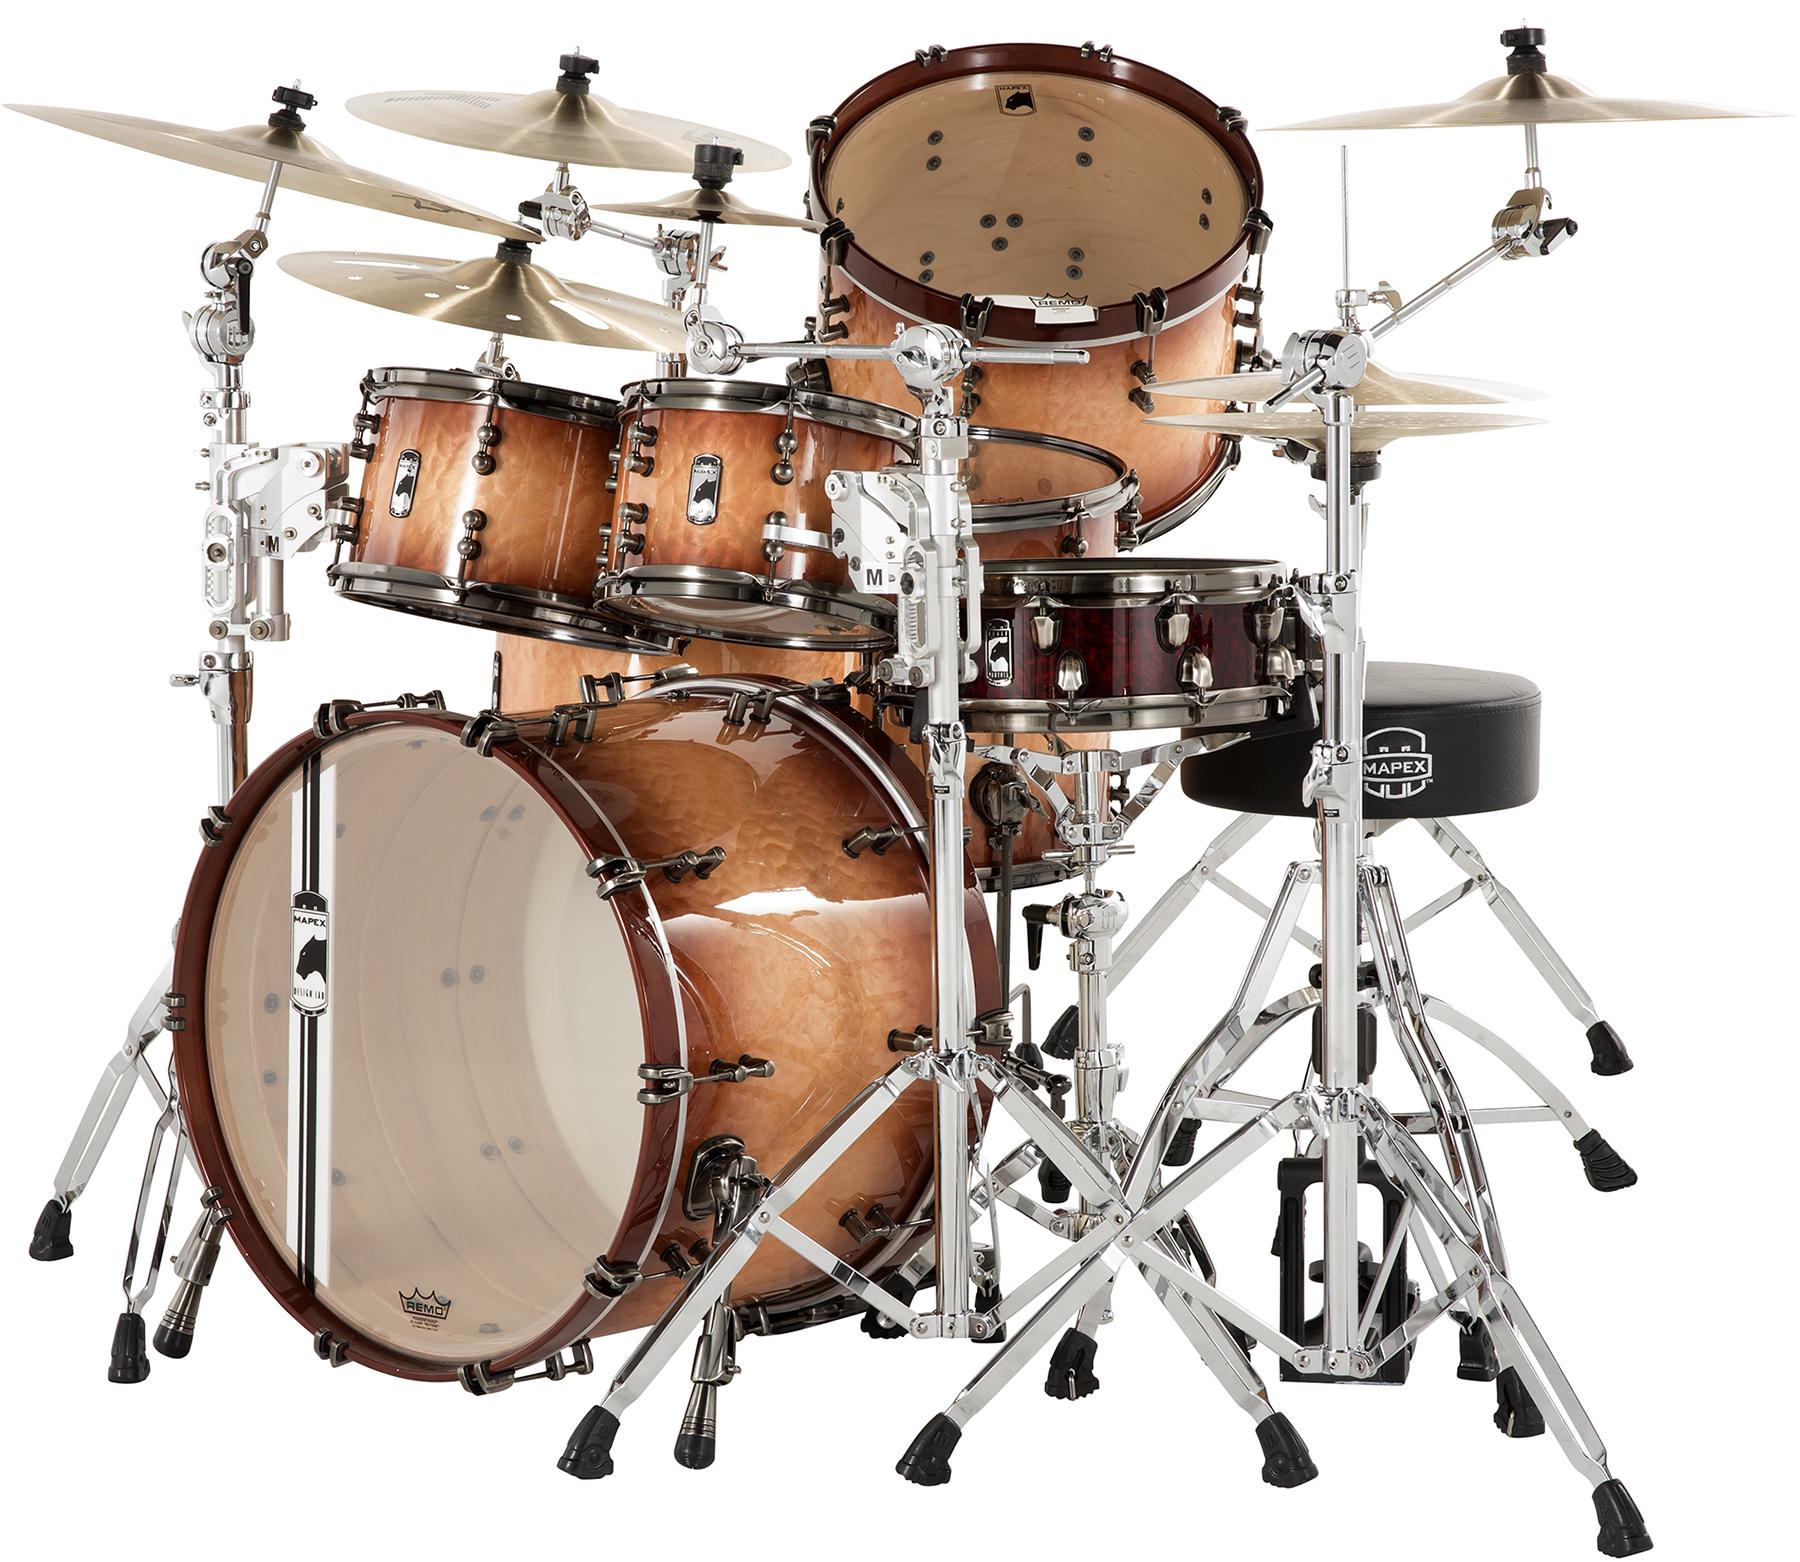 MAATS_drum_set.jpg